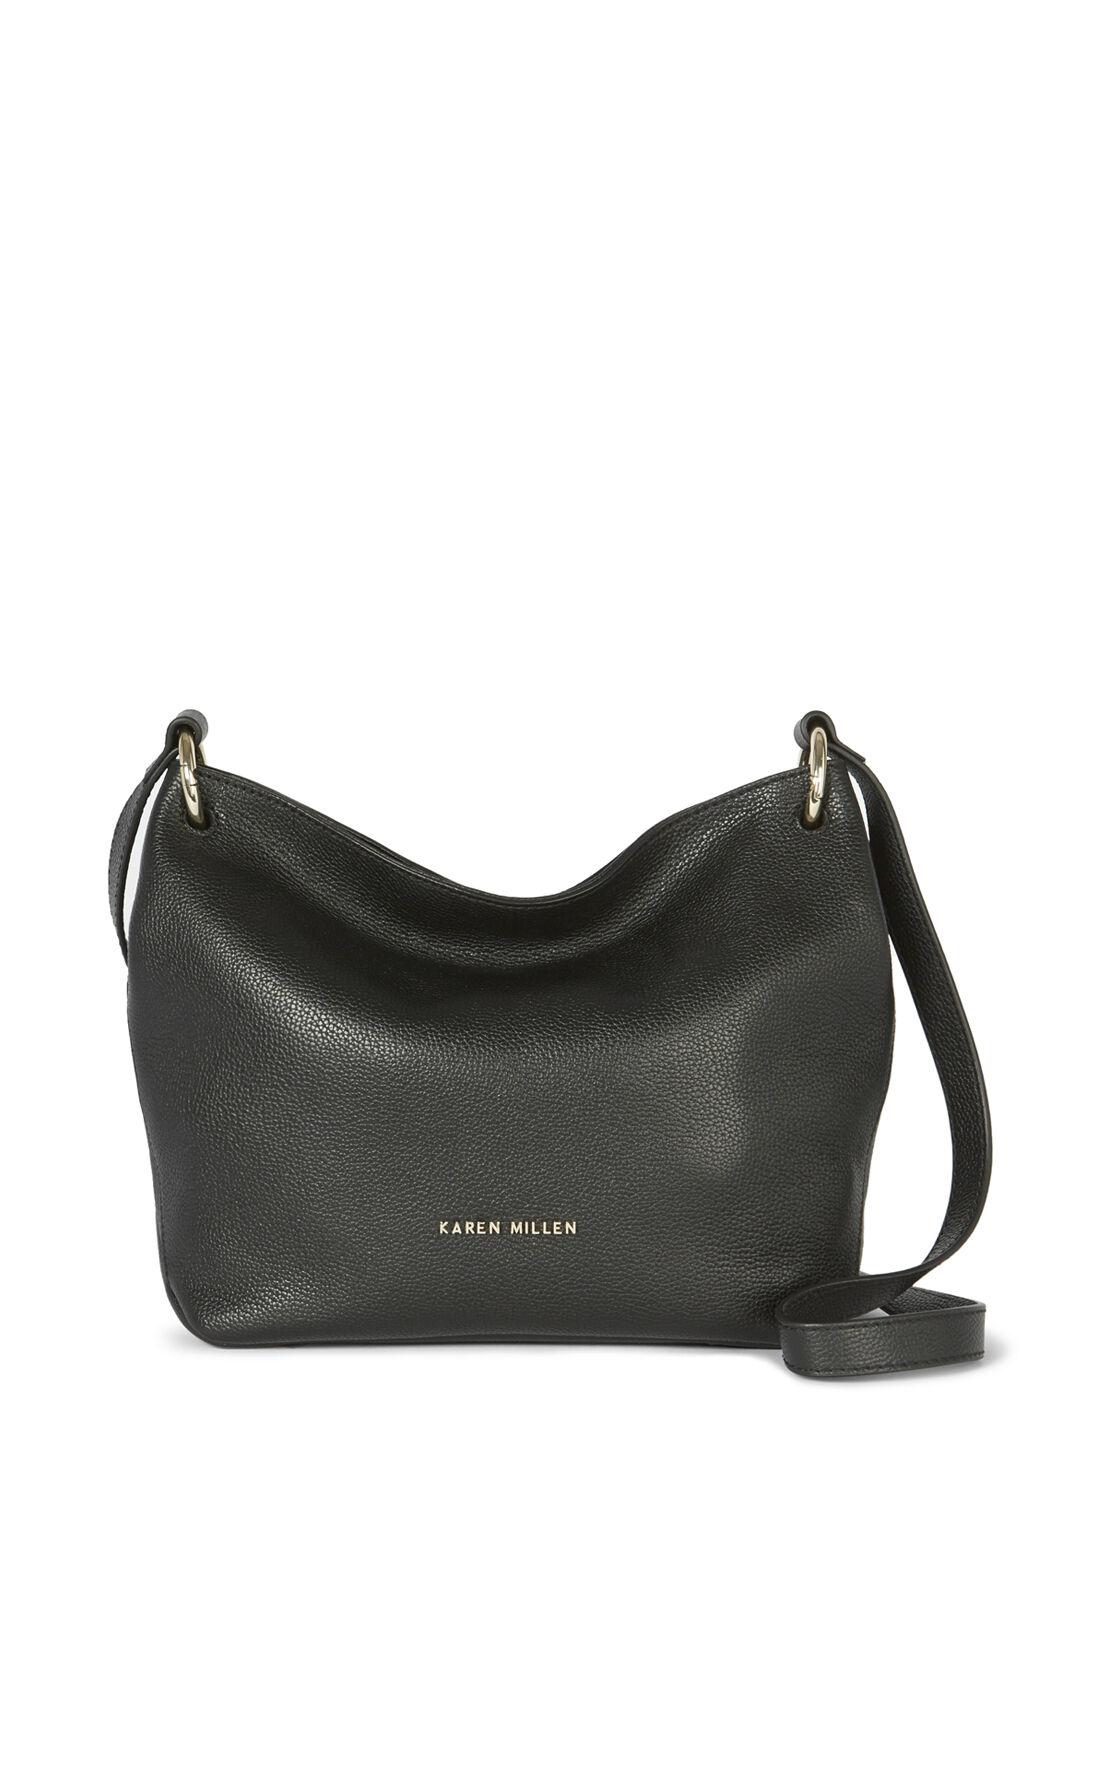 Karen Millen, SOFT SLOUCH BAG Black 0